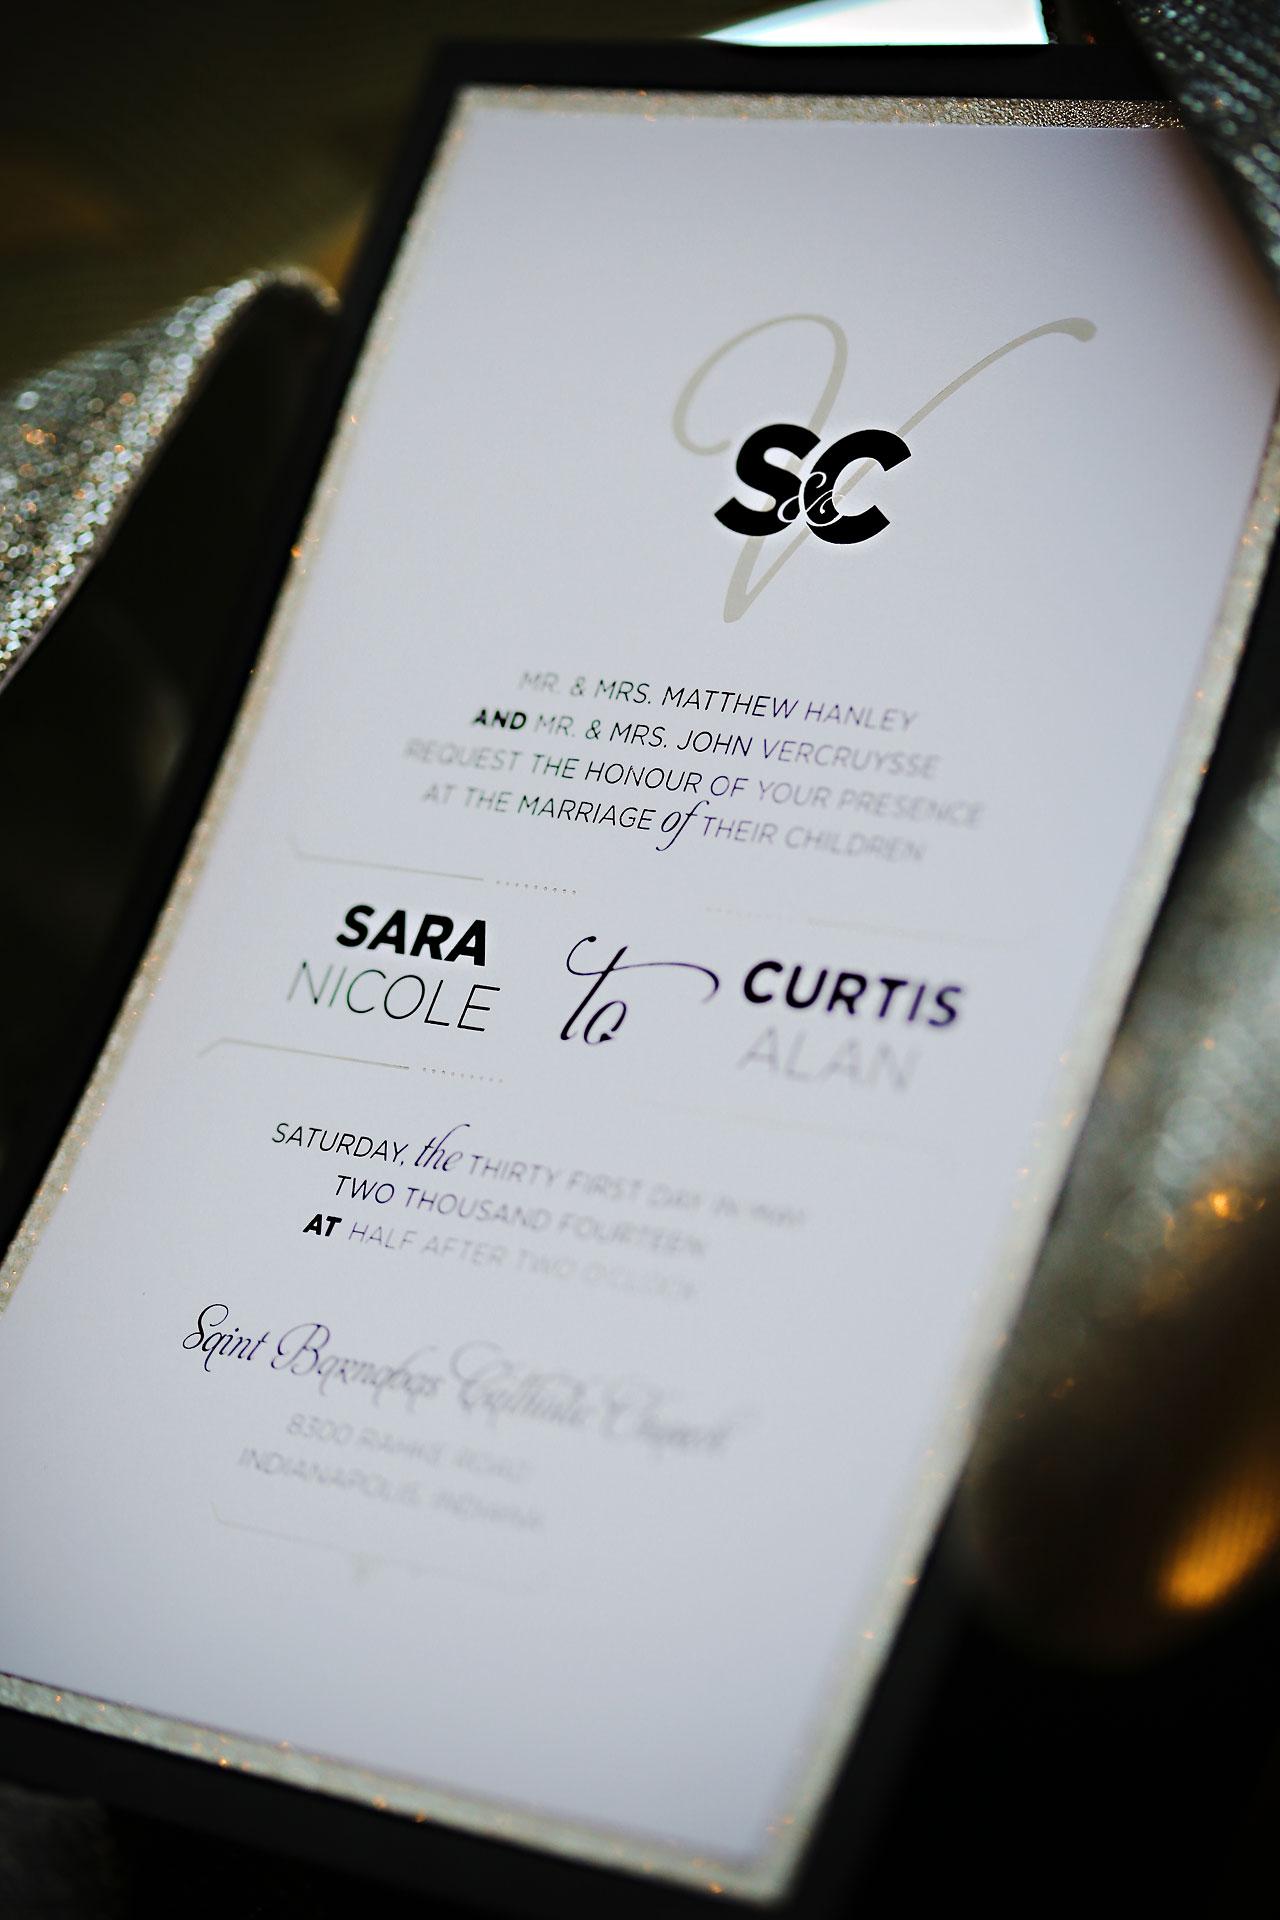 SaraCurtis 003